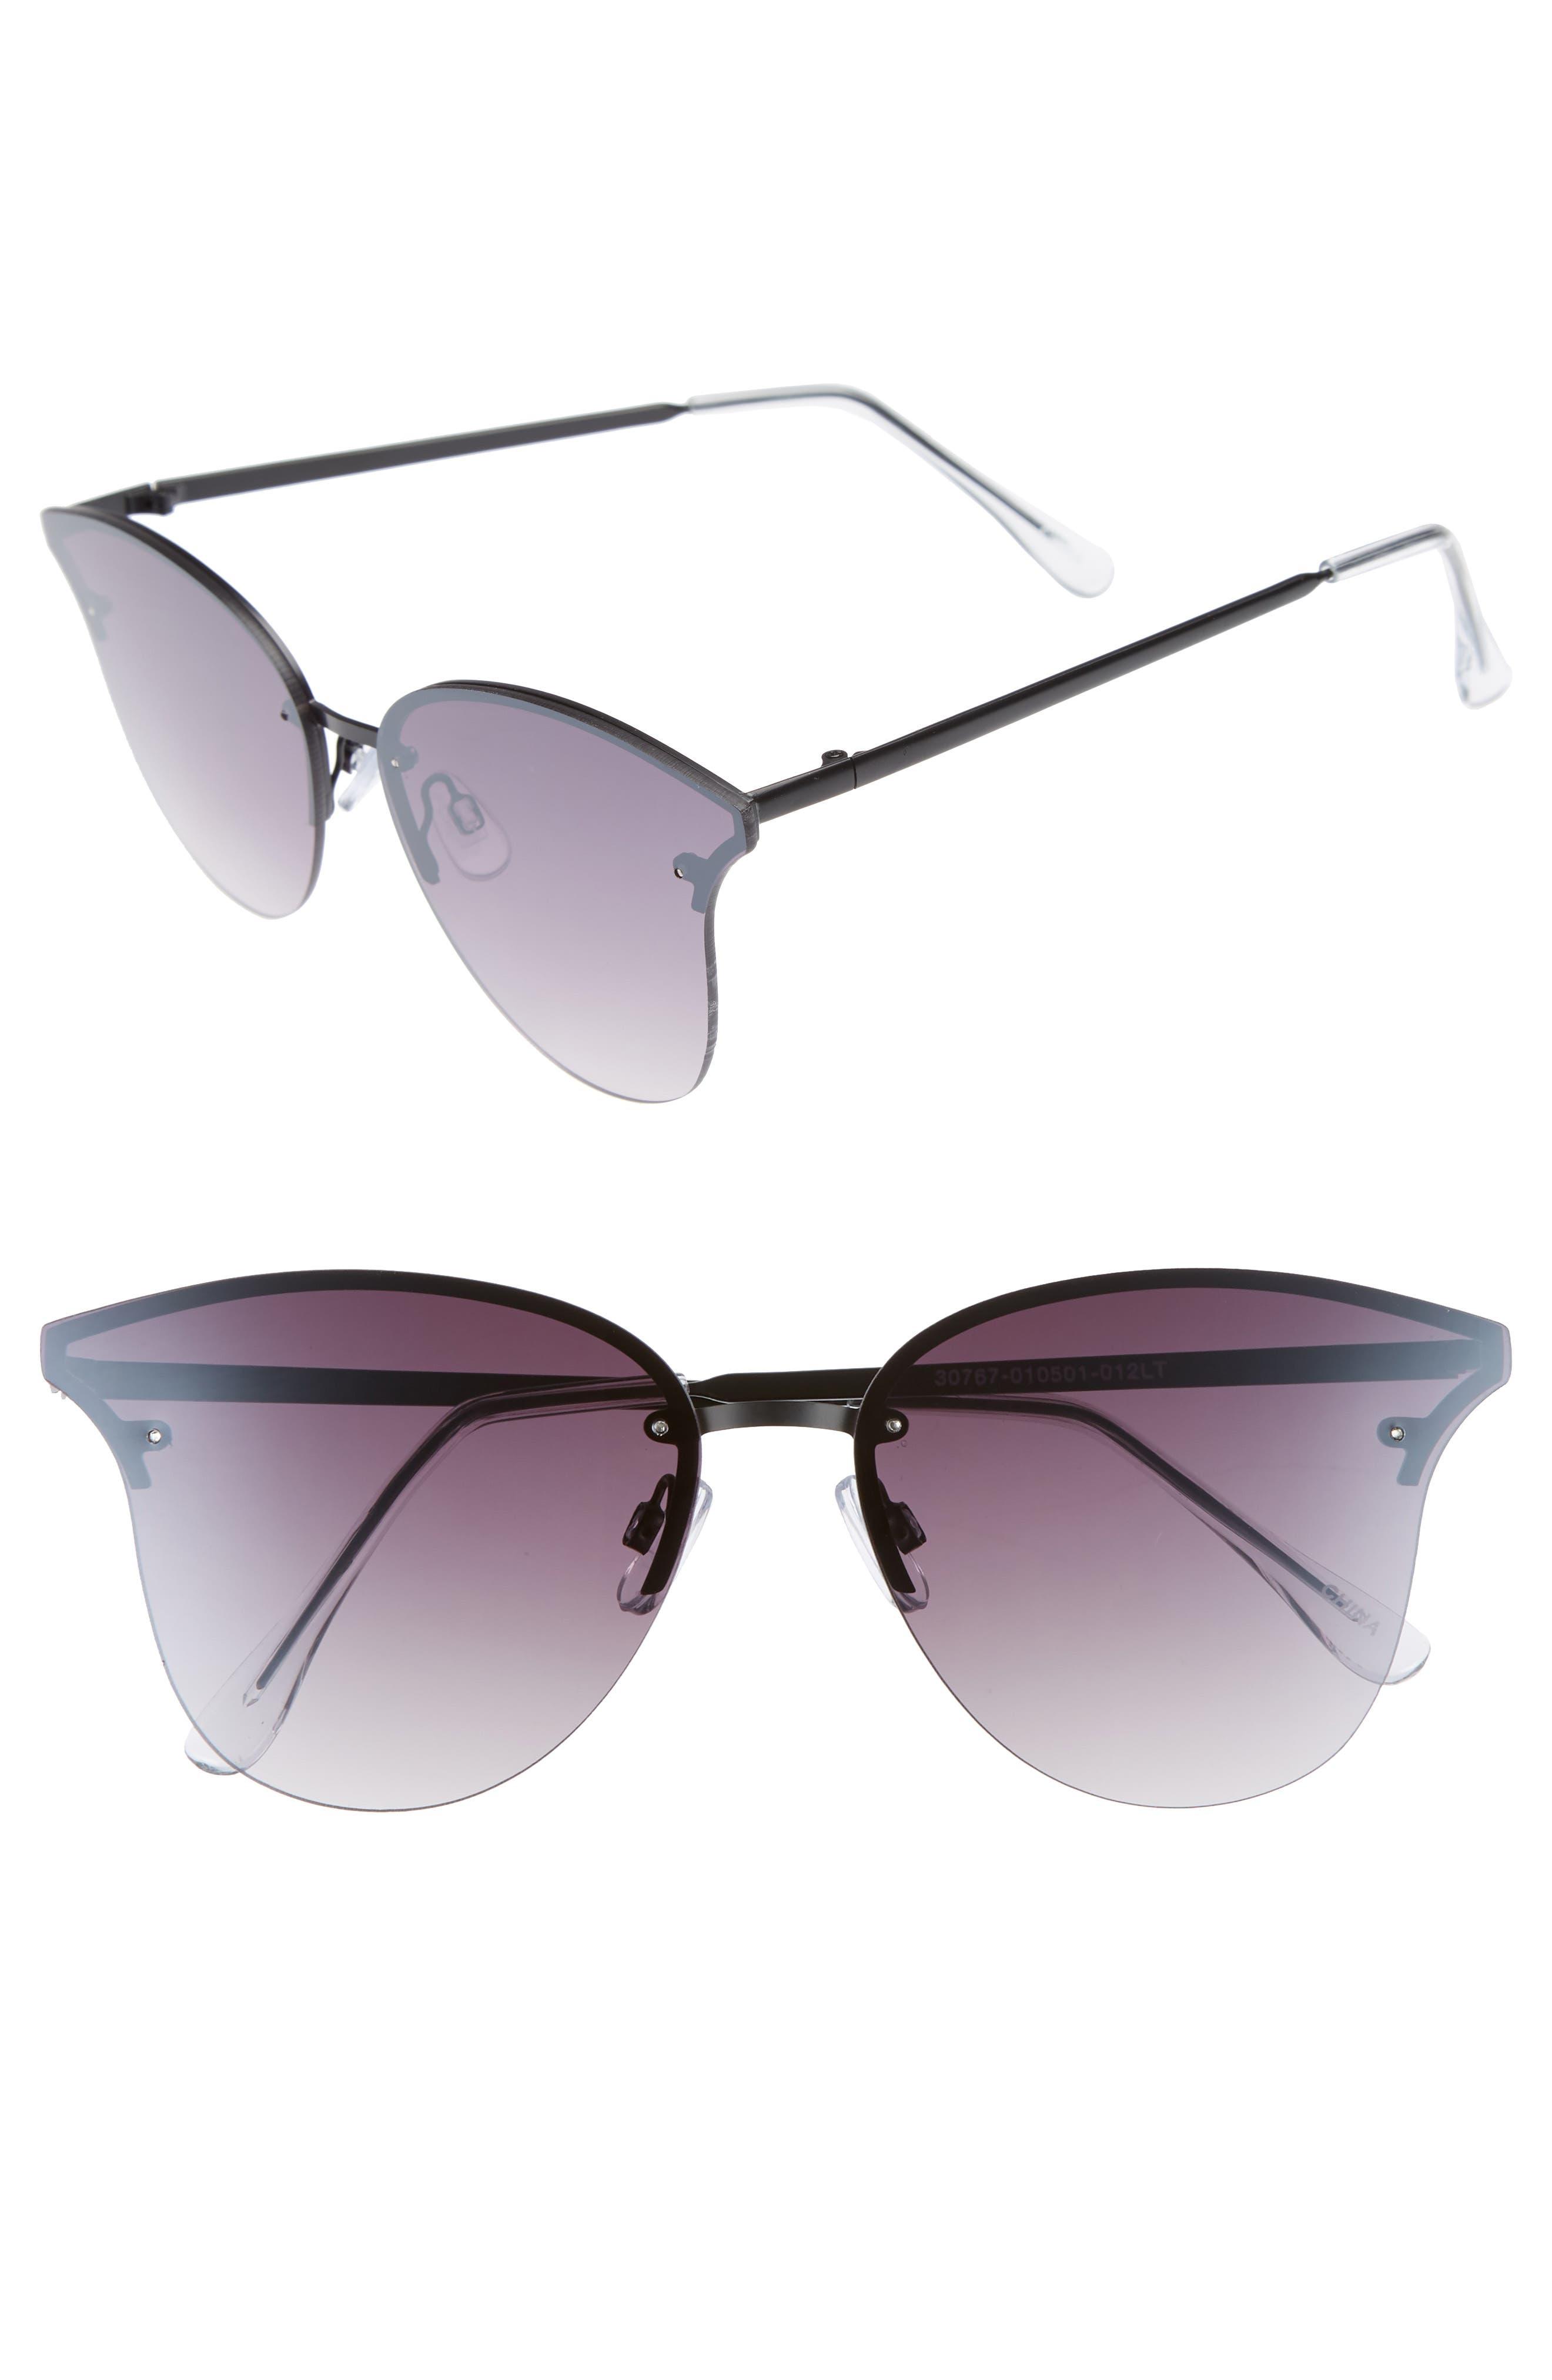 61mm Rimless Cat Eye Sunglasses,                         Main,                         color, 001